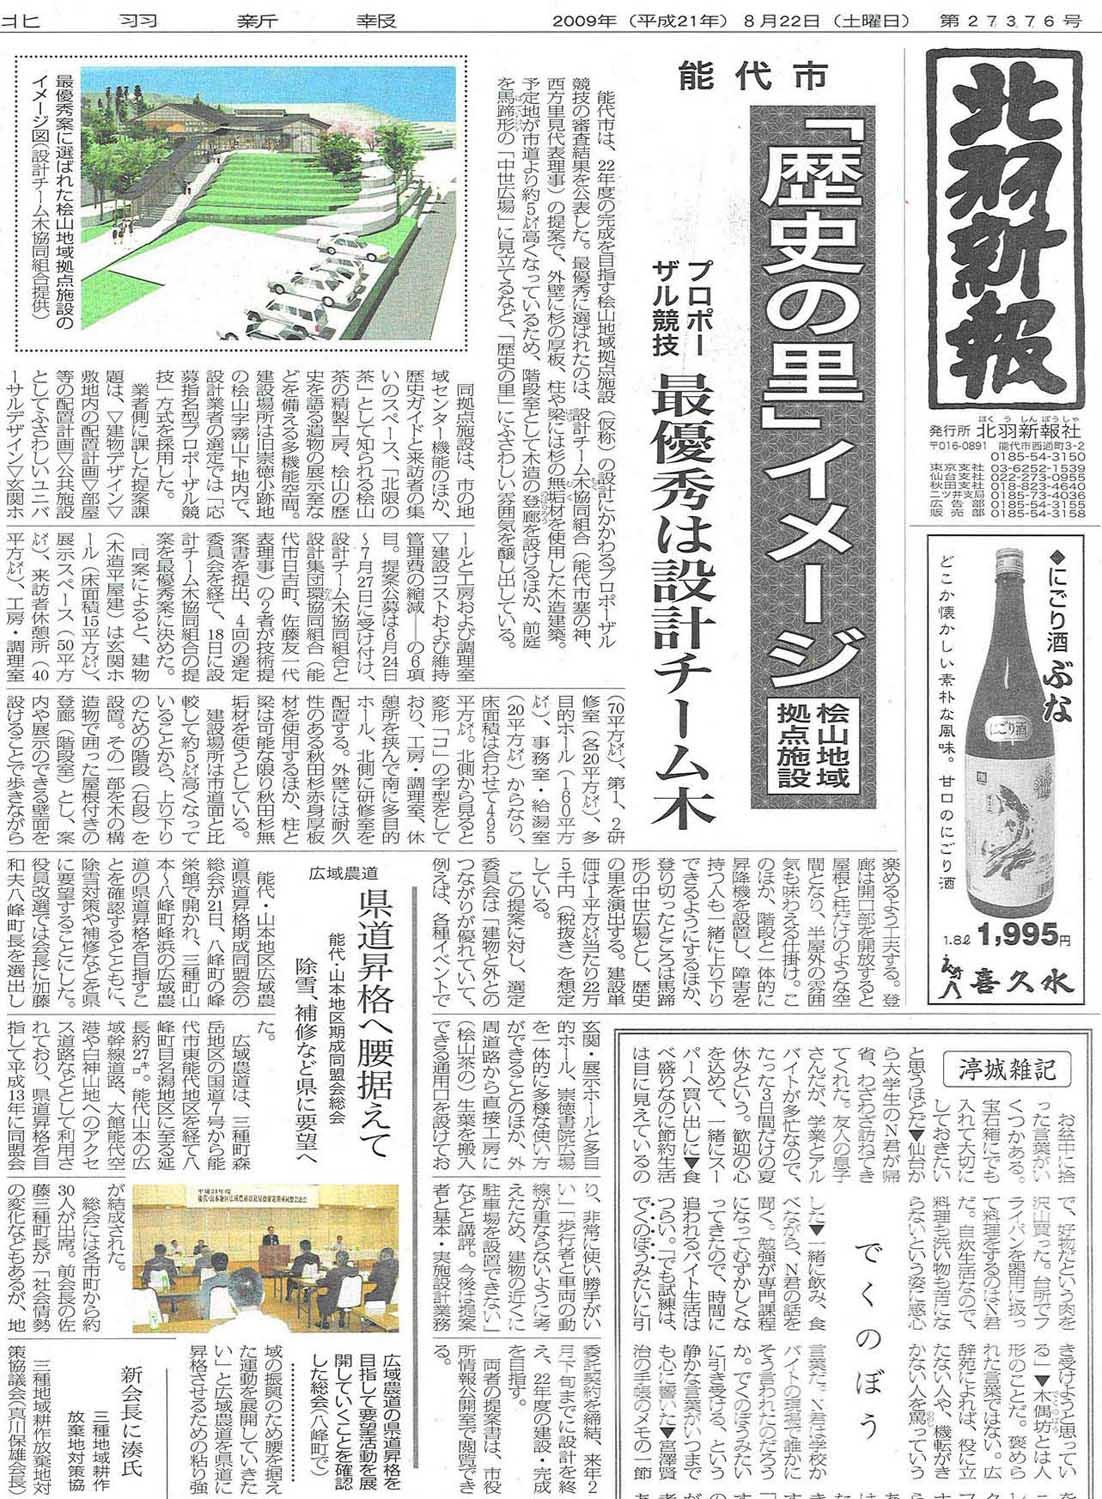 檜山地域拠点施設プロポ:北羽新報_e0054299_16242180.jpg